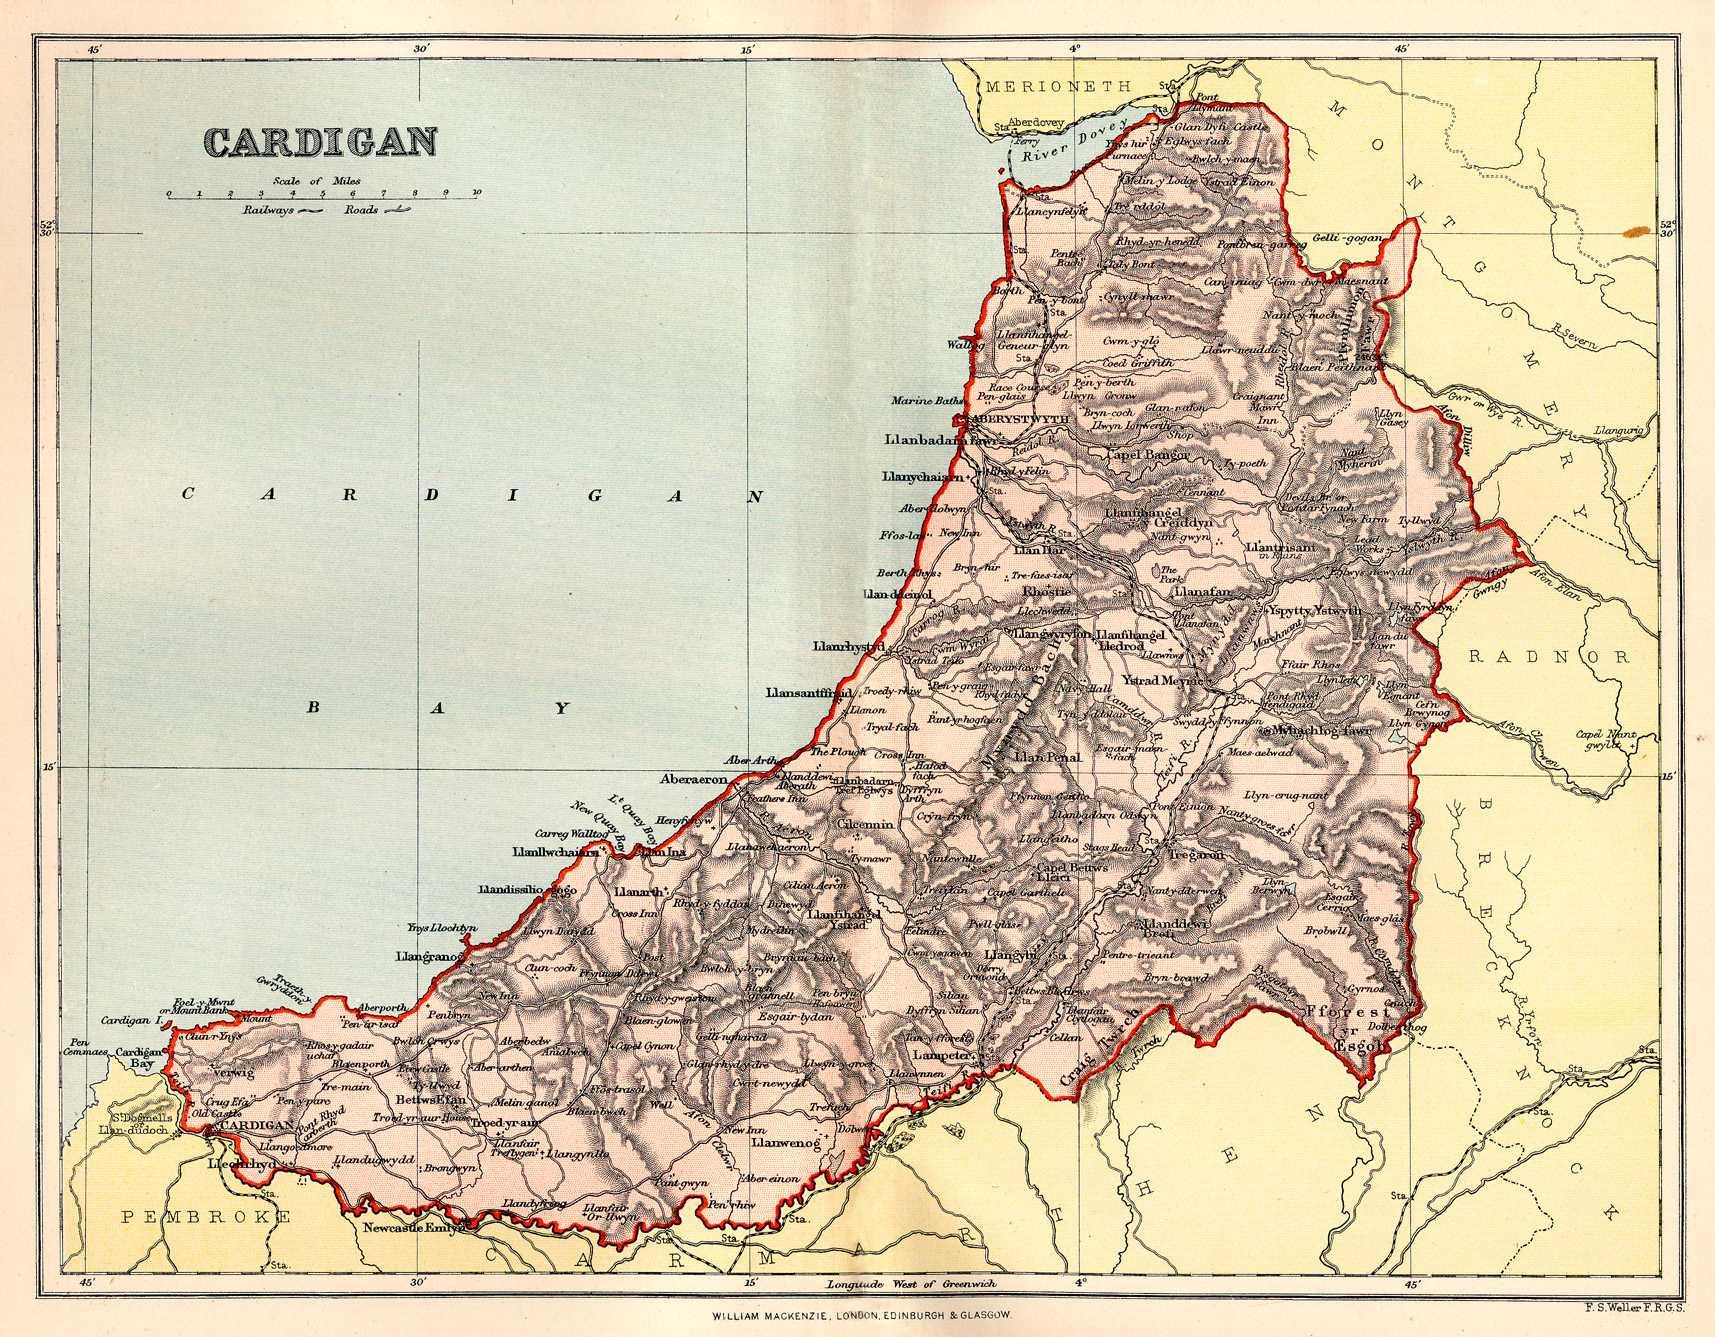 Map of Cardiganshire